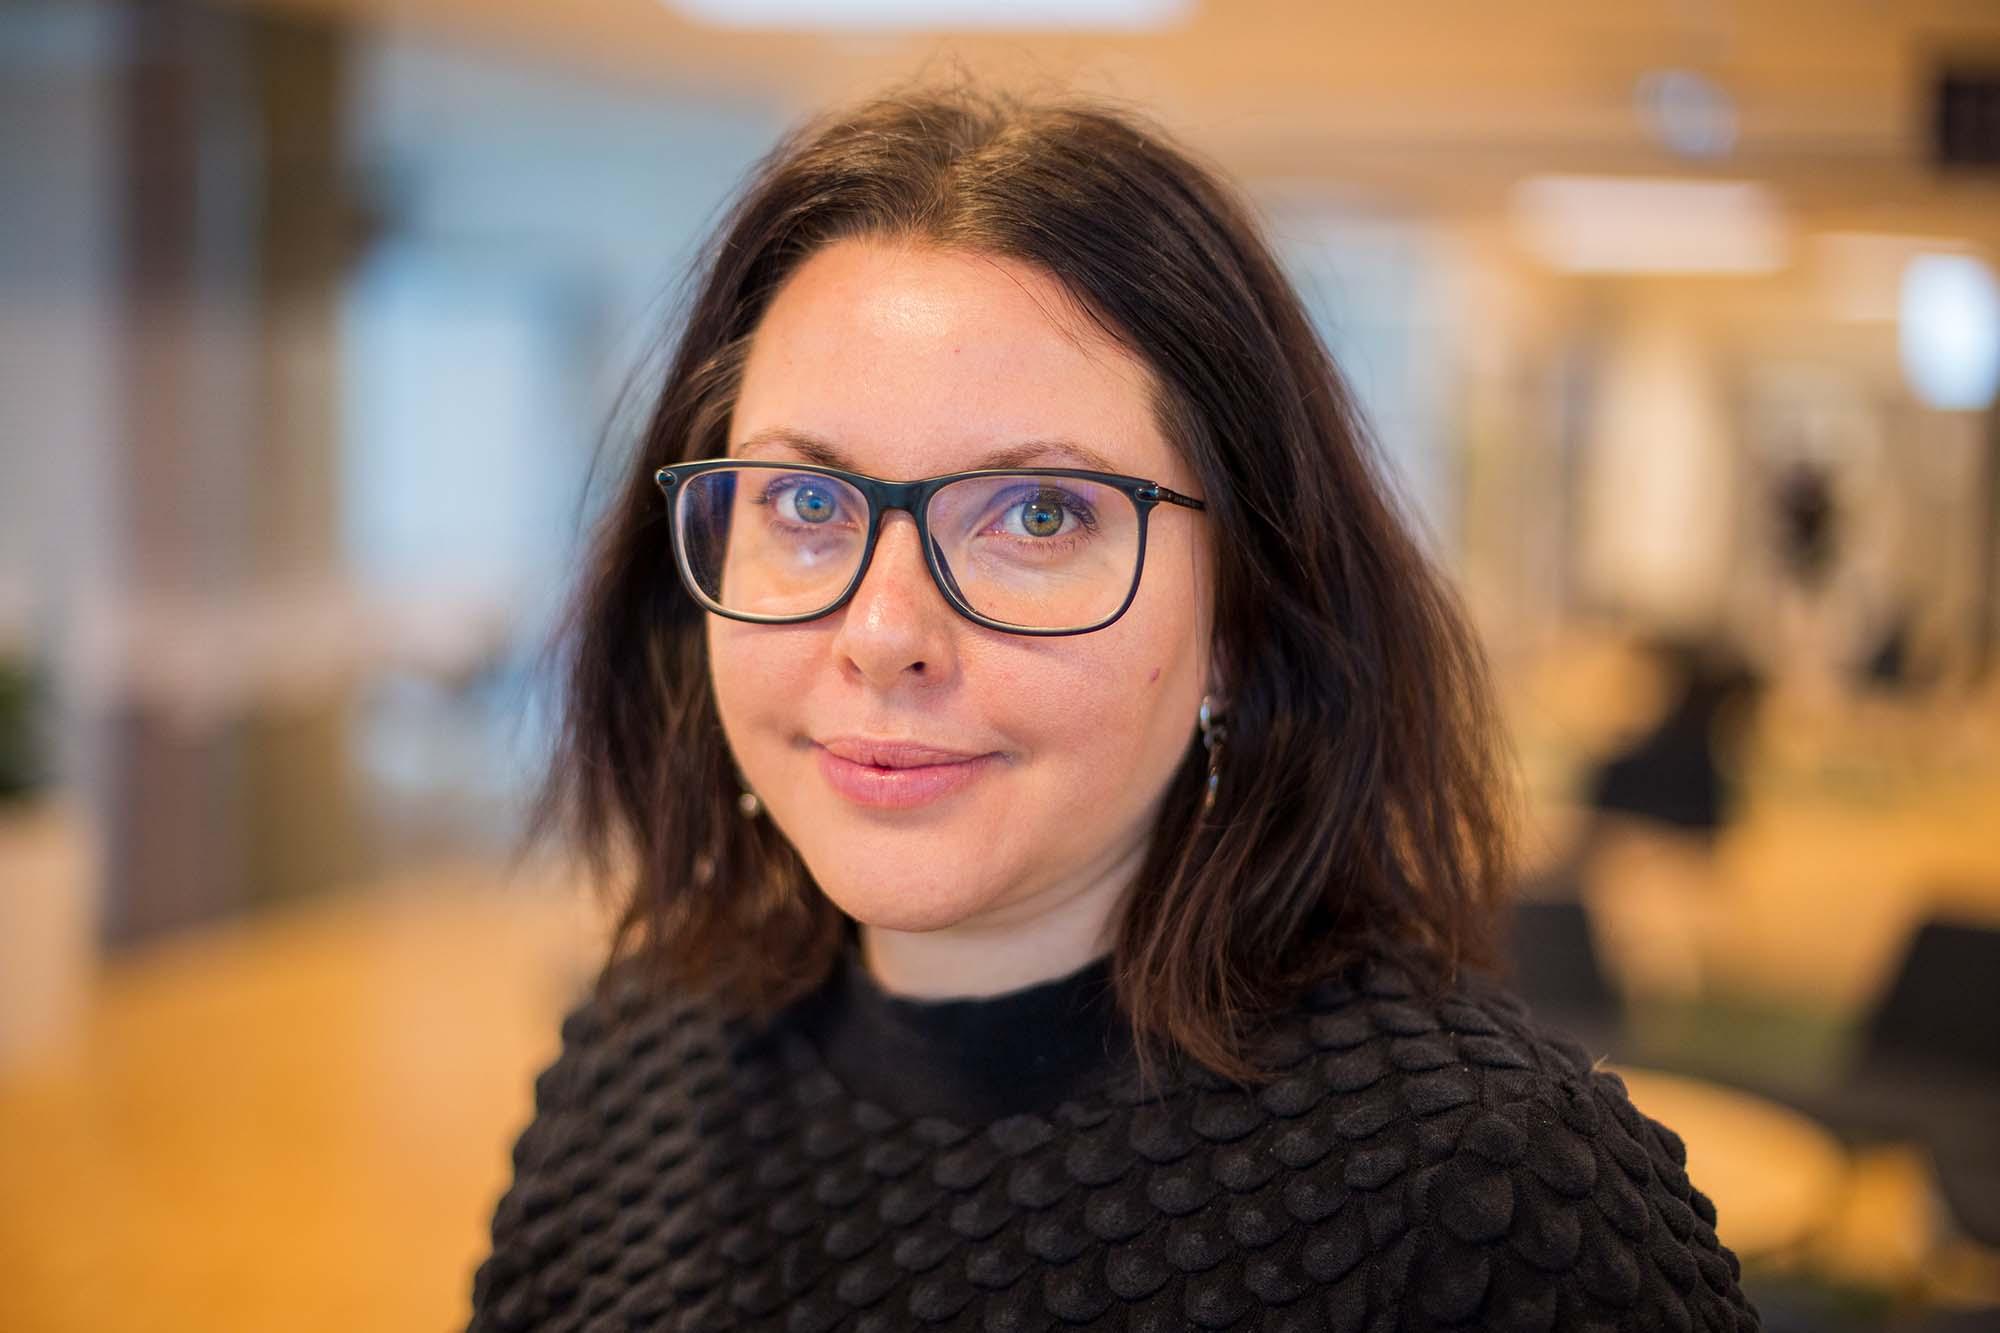 Annika Henning